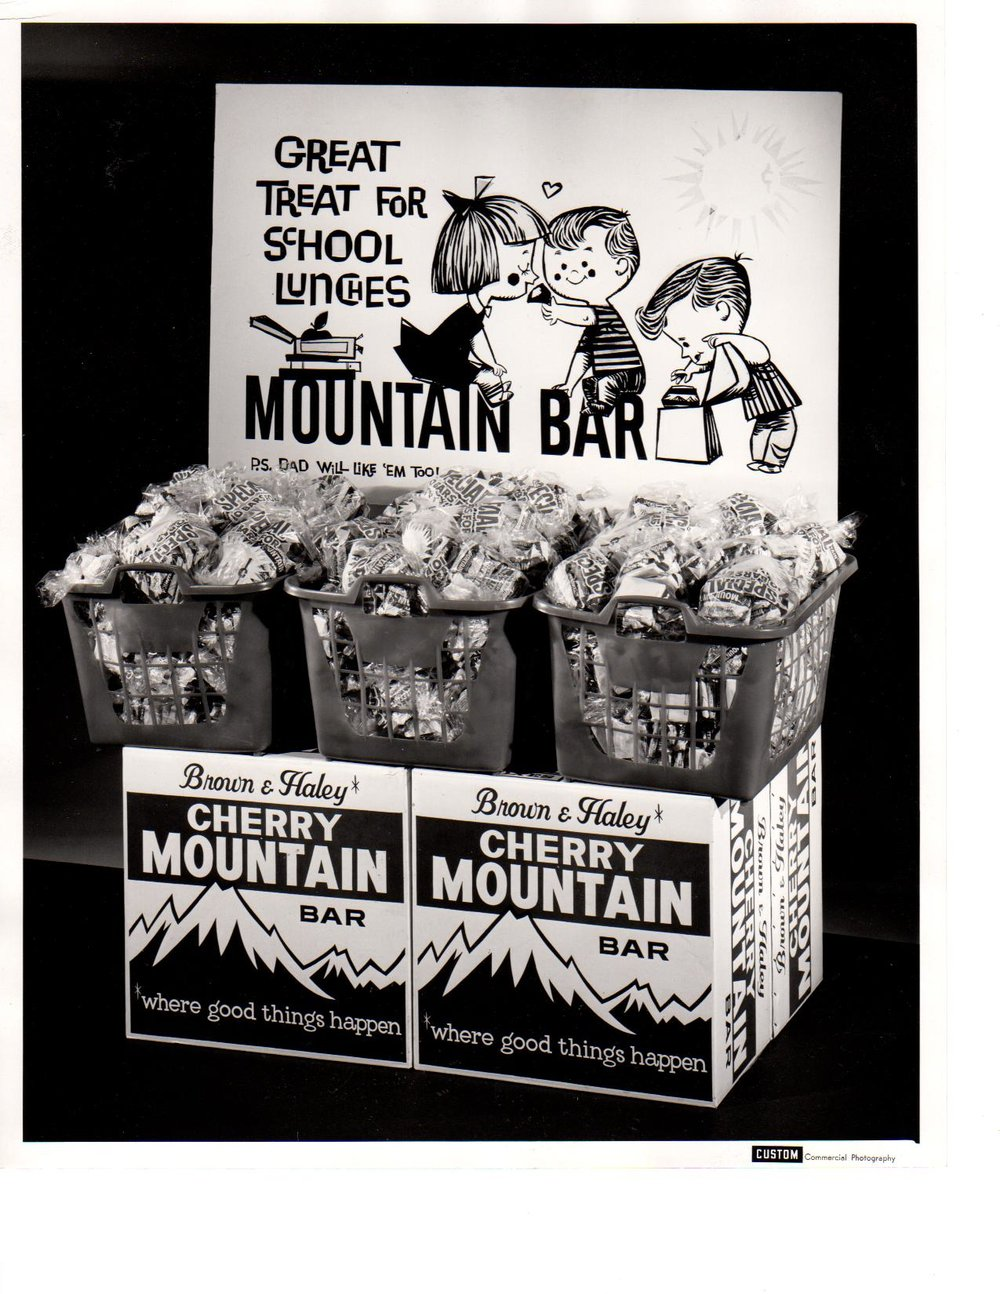 CHERRY MOUNTAIN BAR